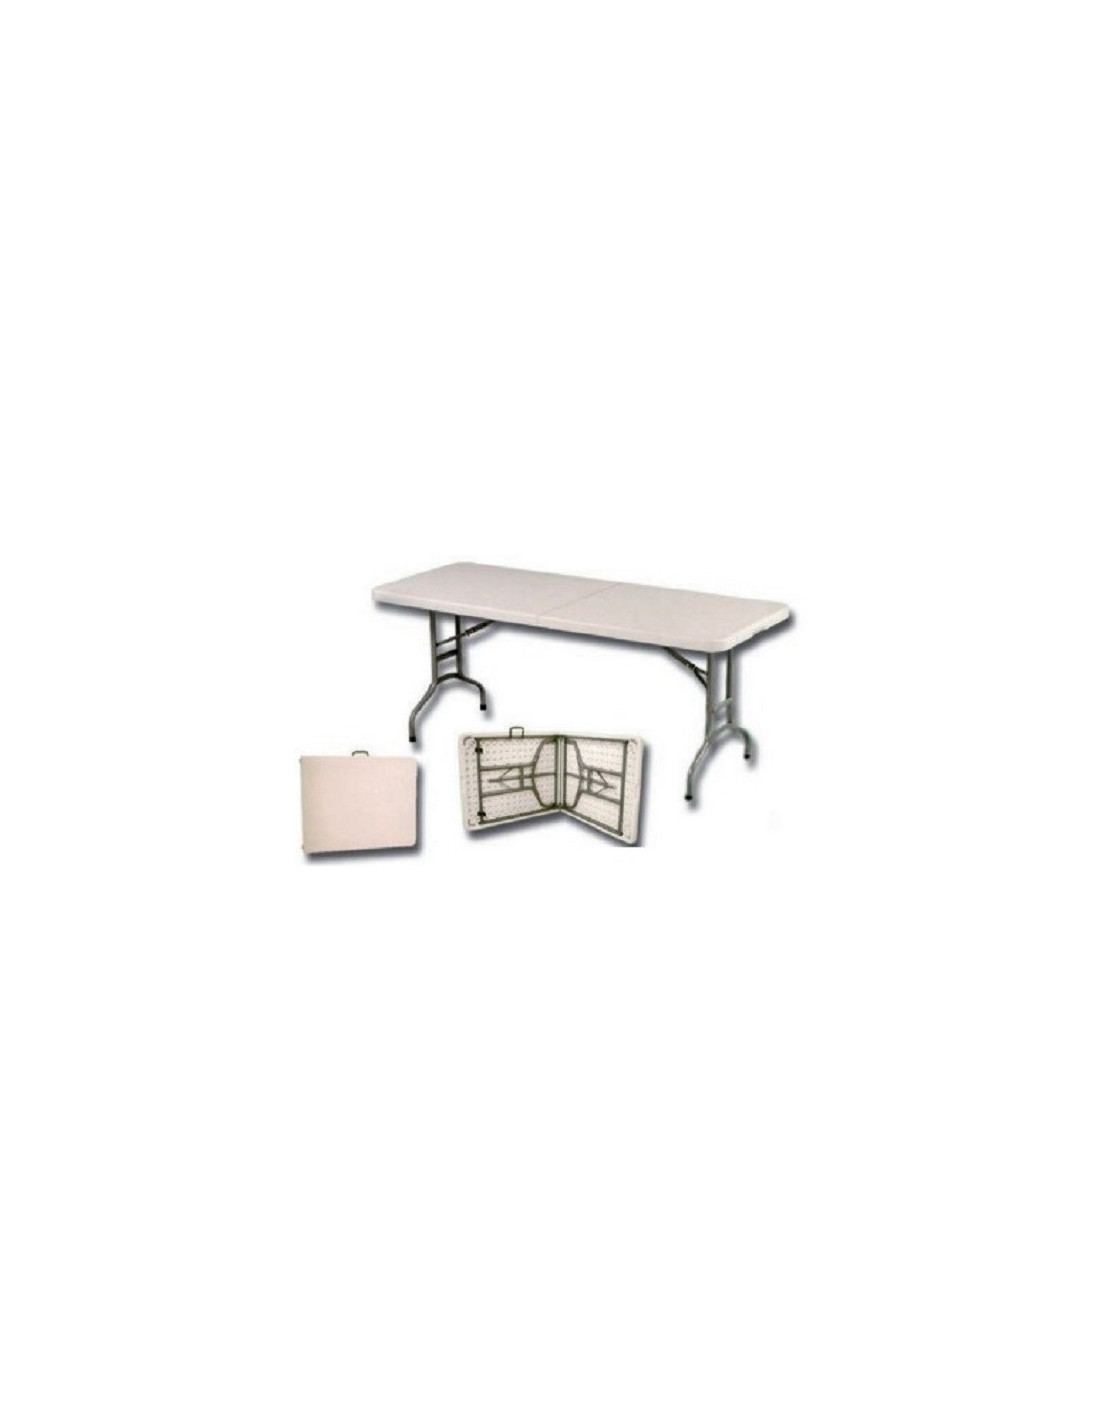 Mesa rectangular de resina plegable 180 x 75 cm tienda - Mesa de resina plegable ...